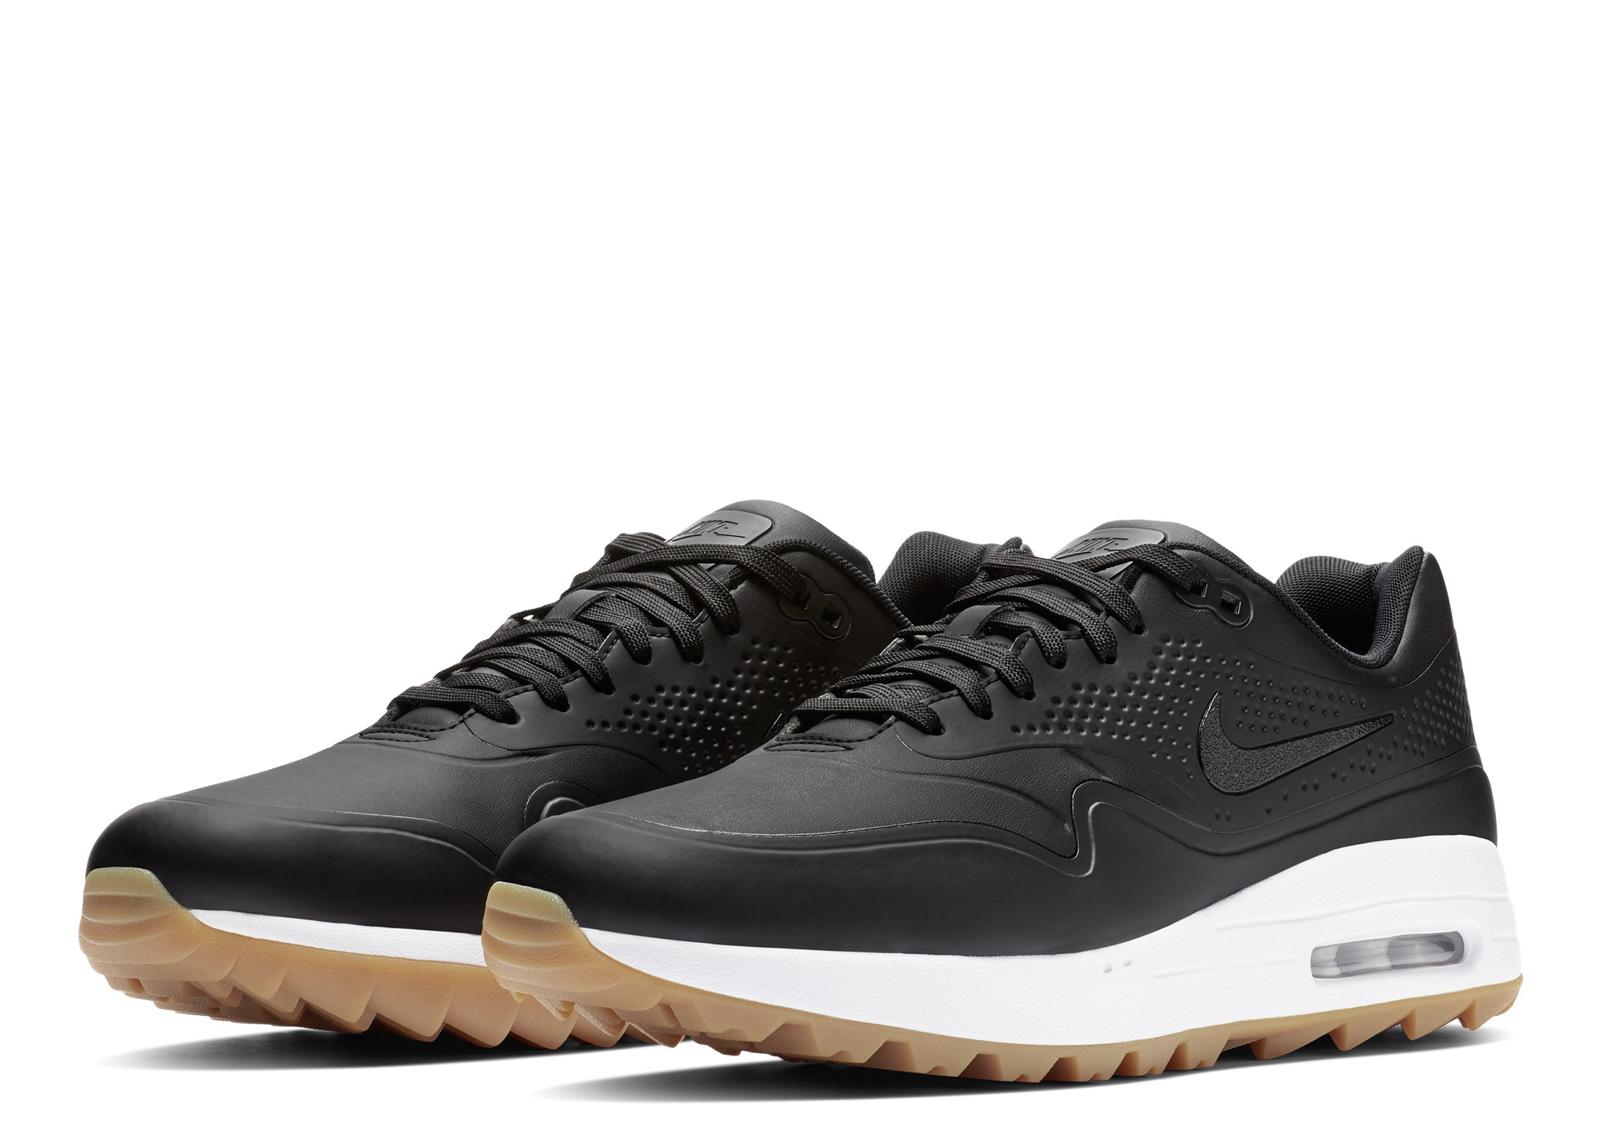 ff8bd2cbf9 Kick Avenue - Authentic Sneakers